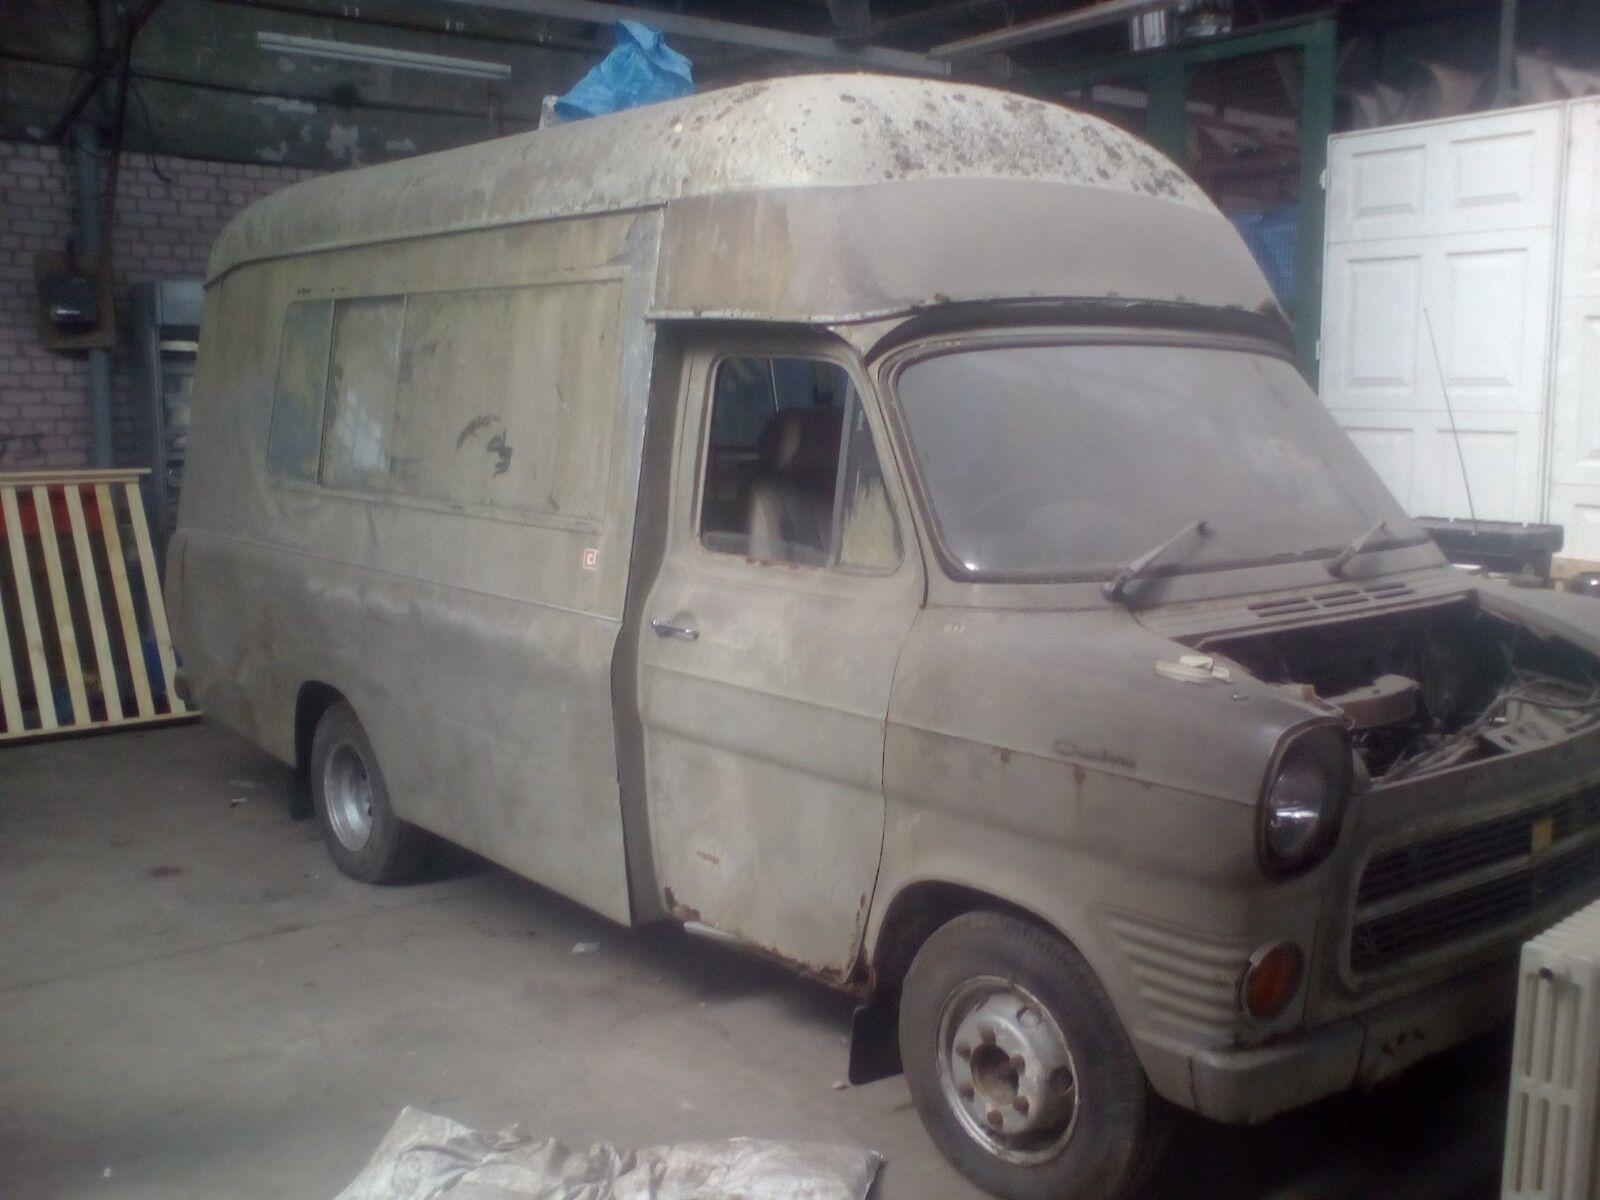 MK1 transit campervan coachworks